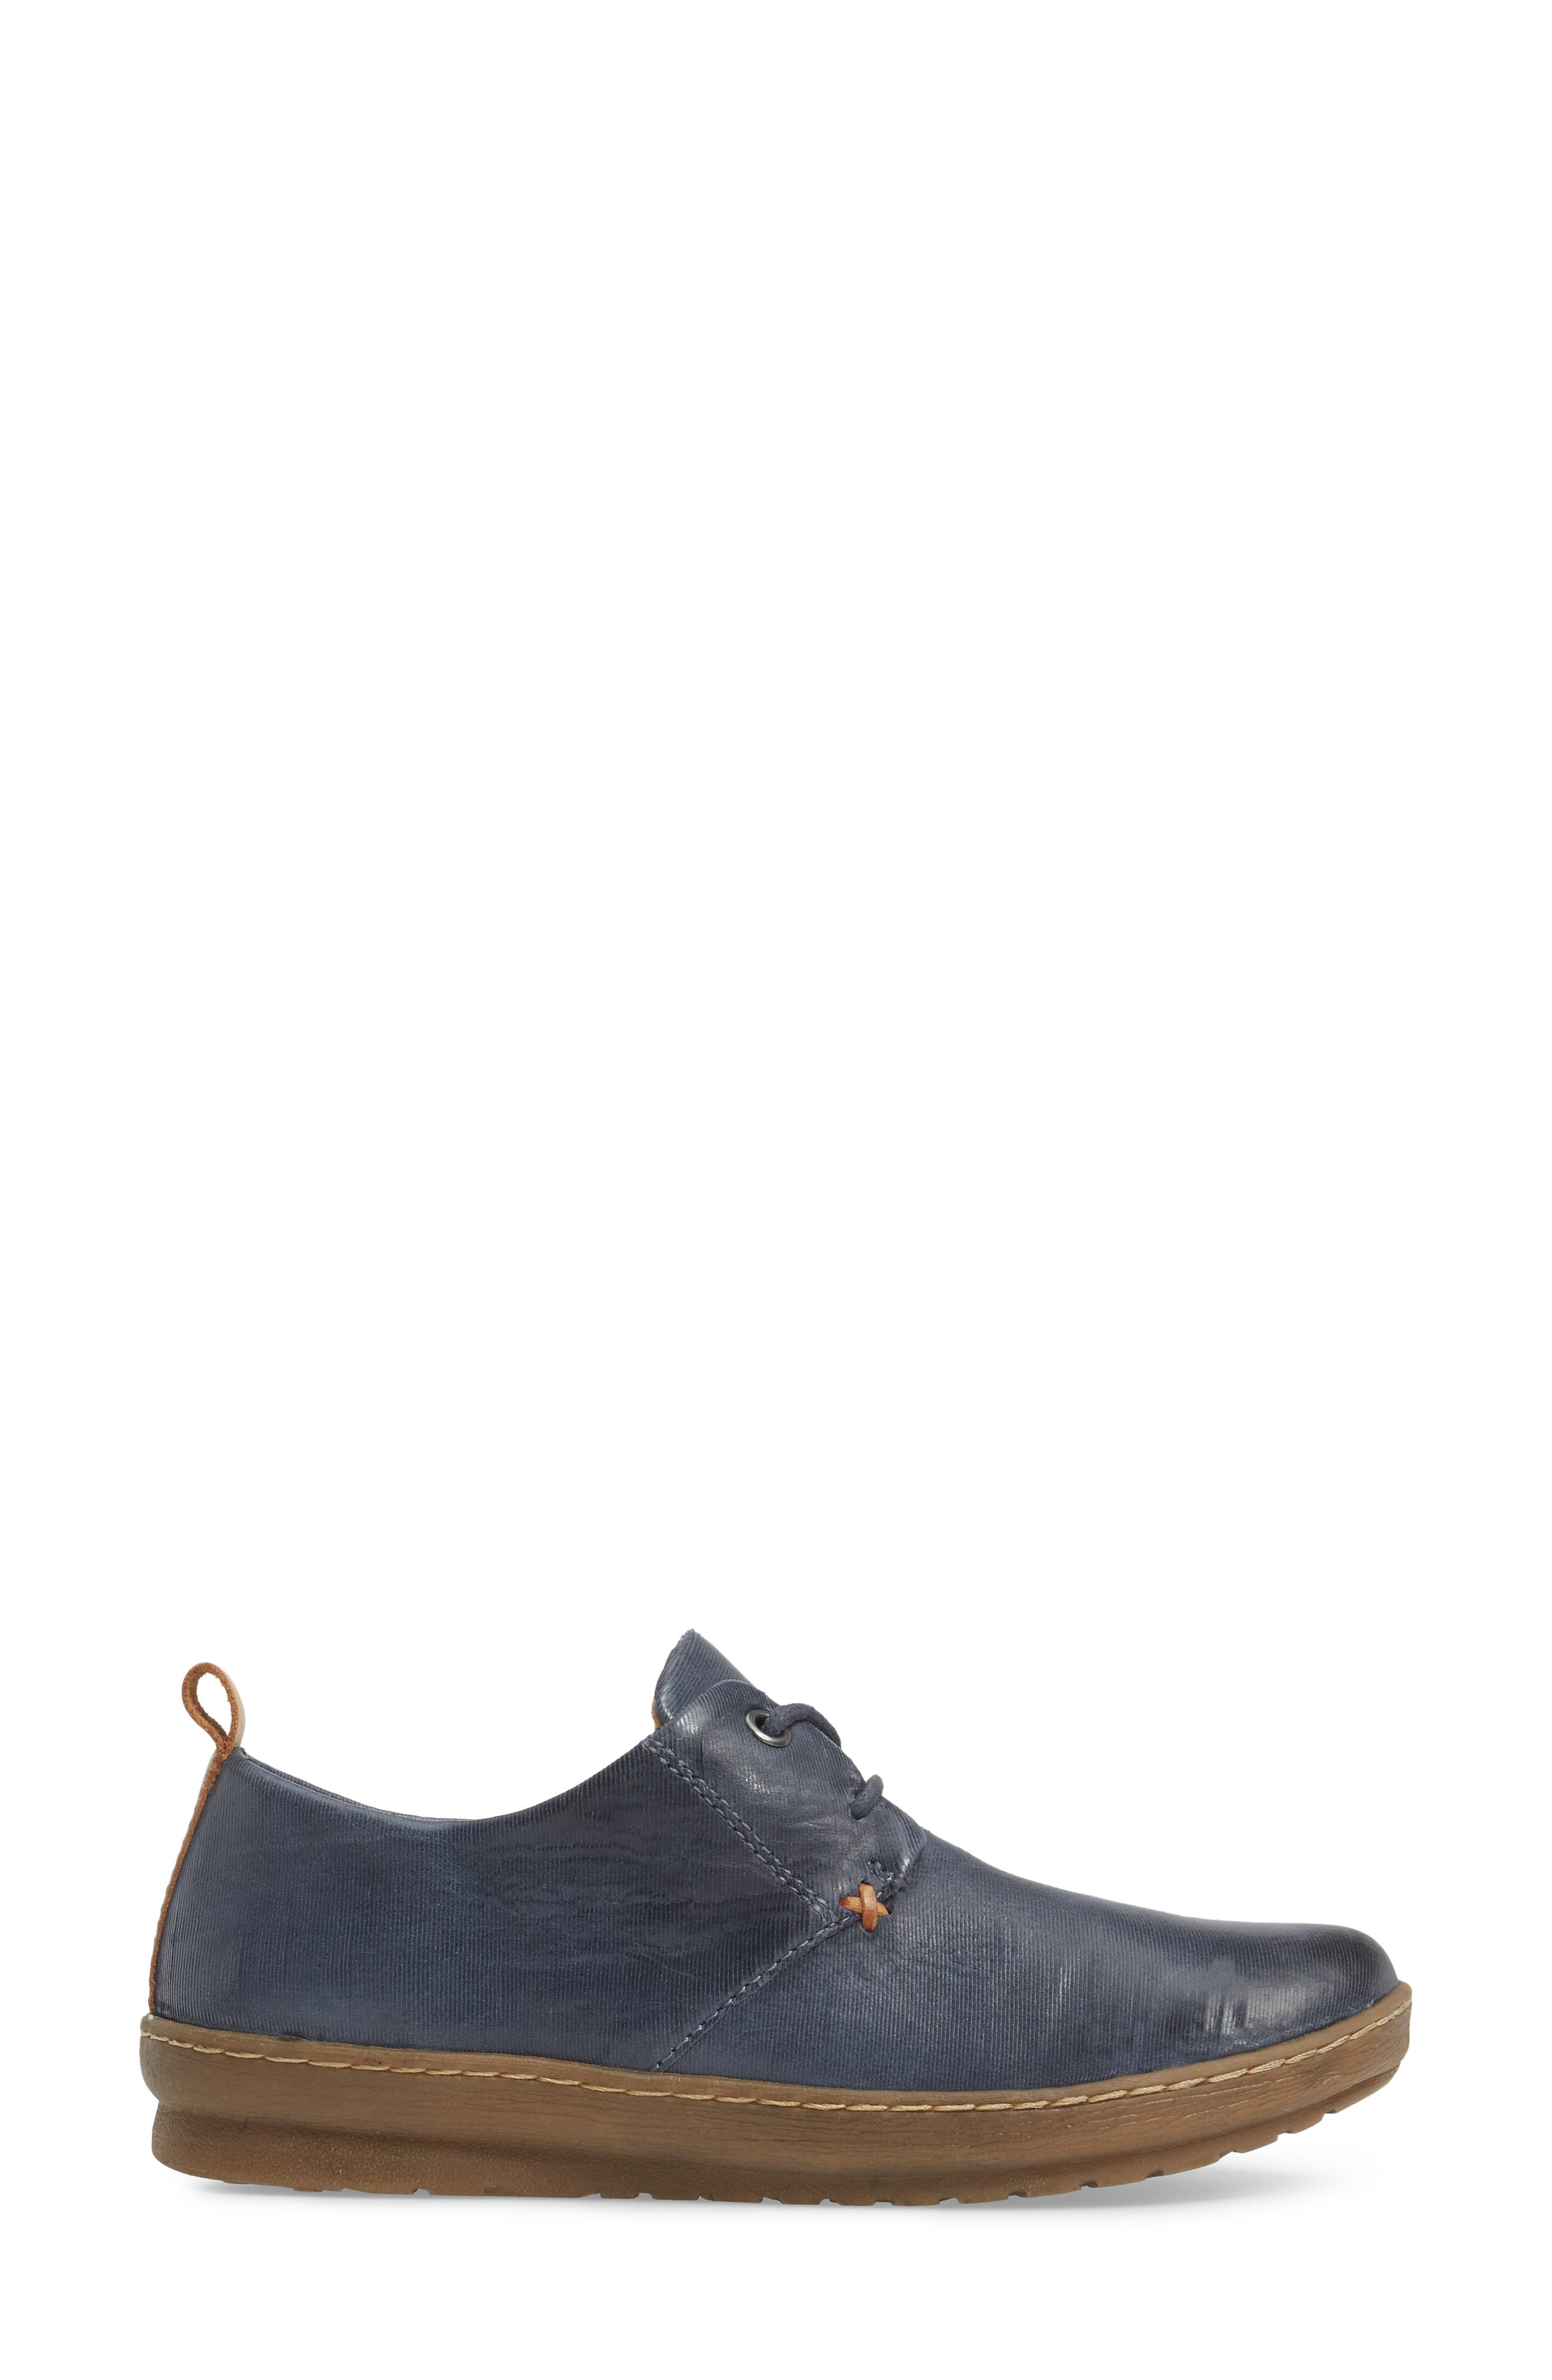 Cassandra Siped Sneaker,                             Alternate thumbnail 3, color,                             Denim Blue Leather